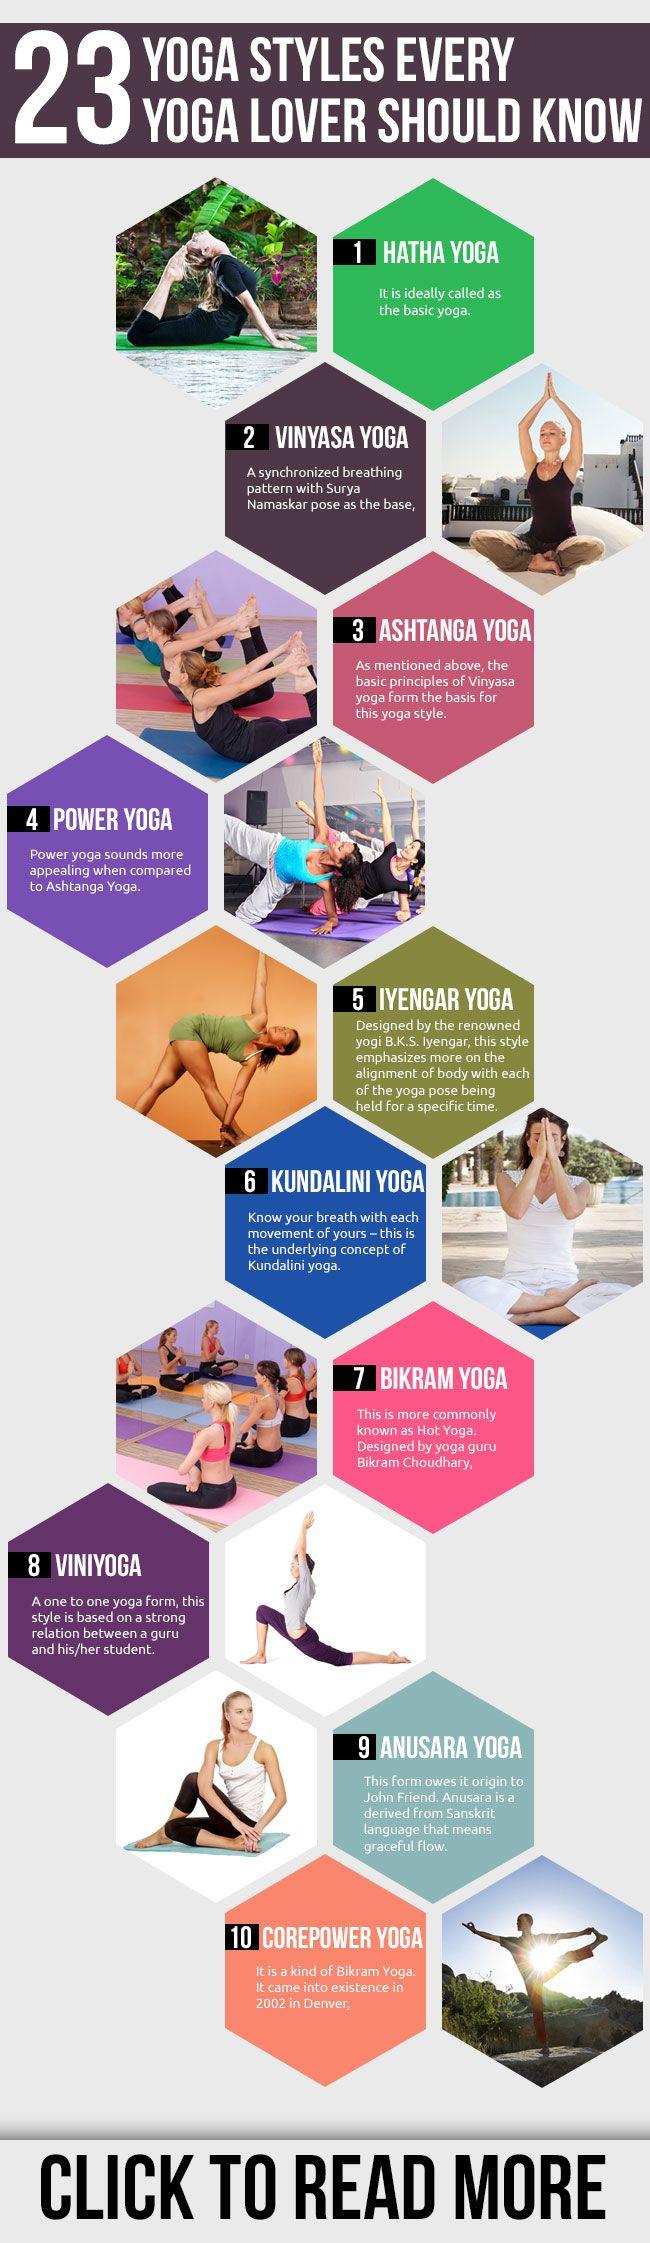 23 Yoga Styles Every Yoga Lover Should Know. www.yogatraveltree.com #findyouryoga #yoga #hatha #vinyasa #ashtanga #poweryoga #iyengar